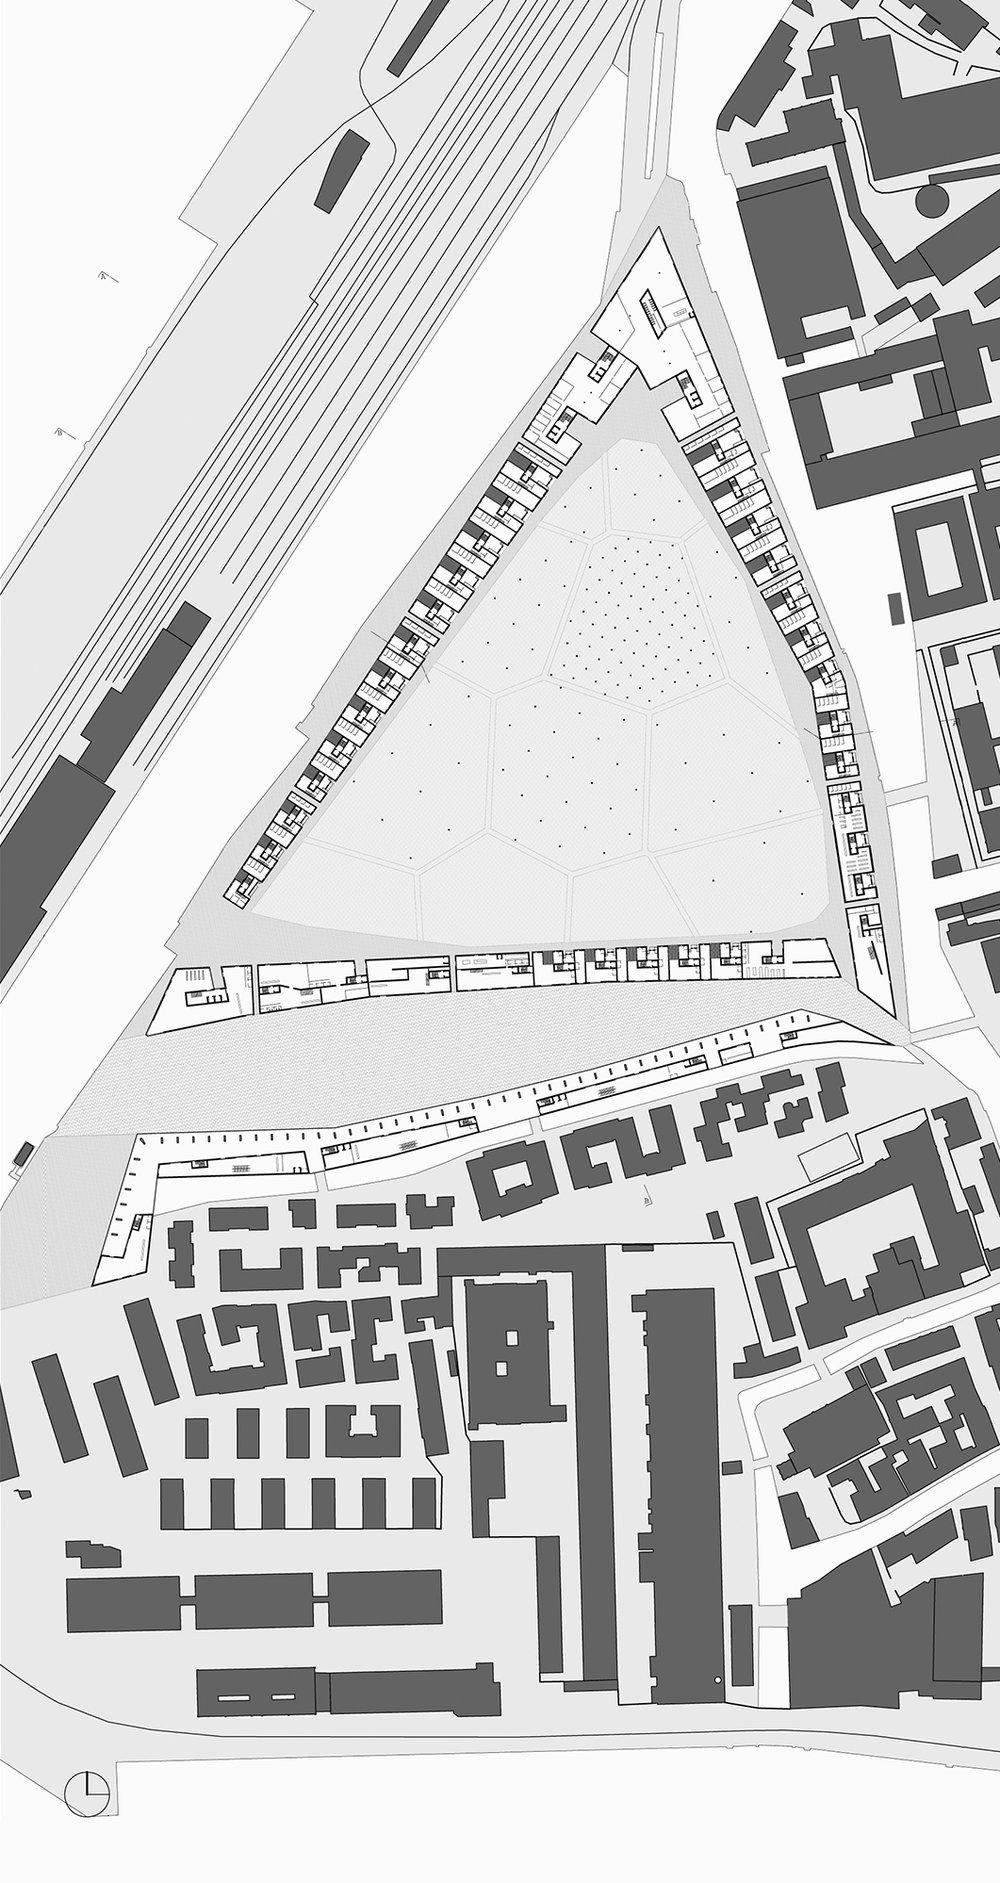 Architektur_offizin-a_Projekte_Kultur_Venedig_ExPiazzaDArmi_09.jpg